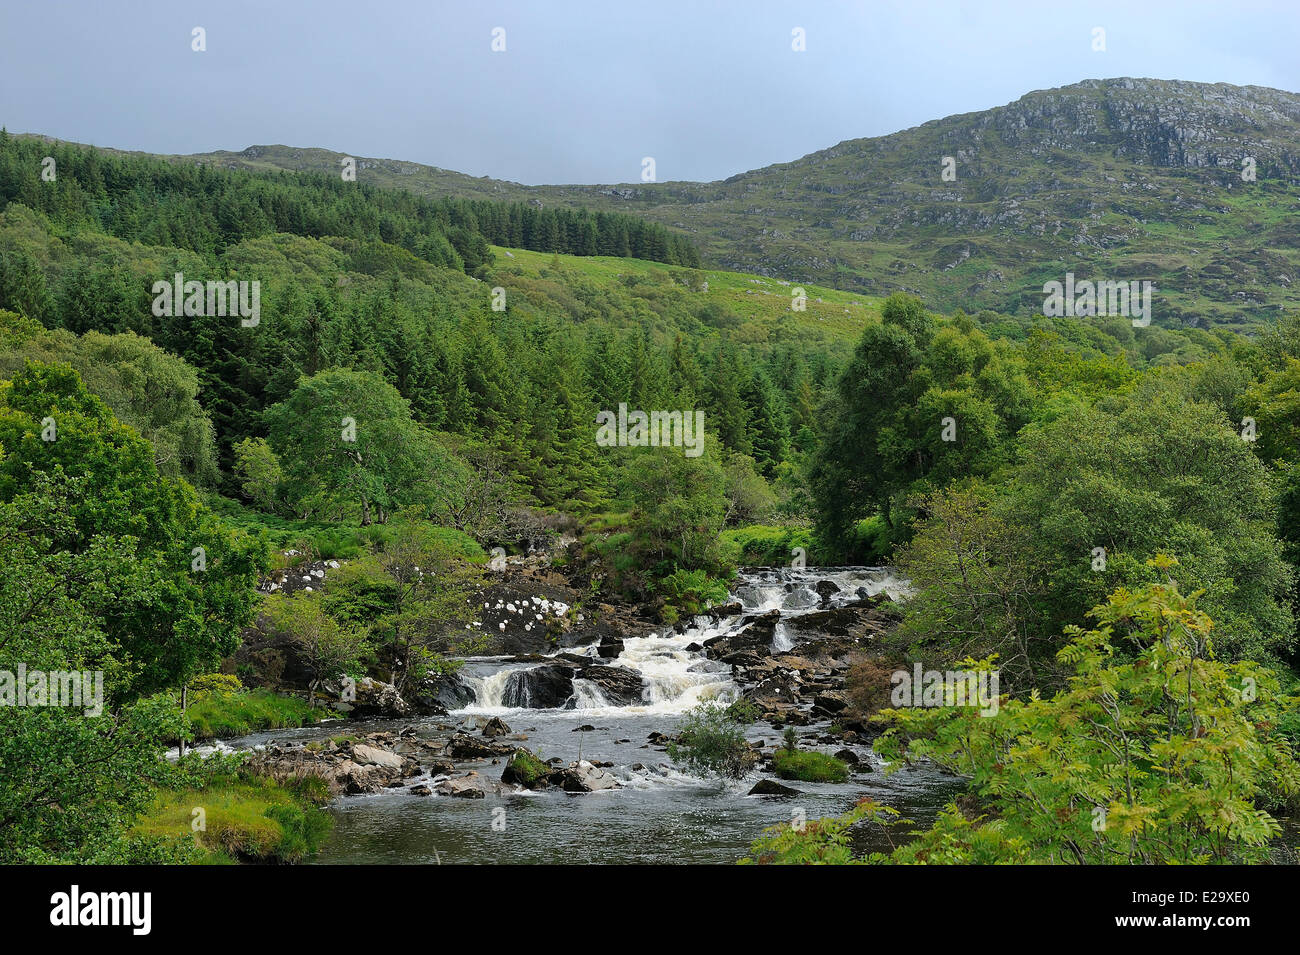 Ireland, County Kerry, Killarney region, Blackwater valley and river - Stock Image